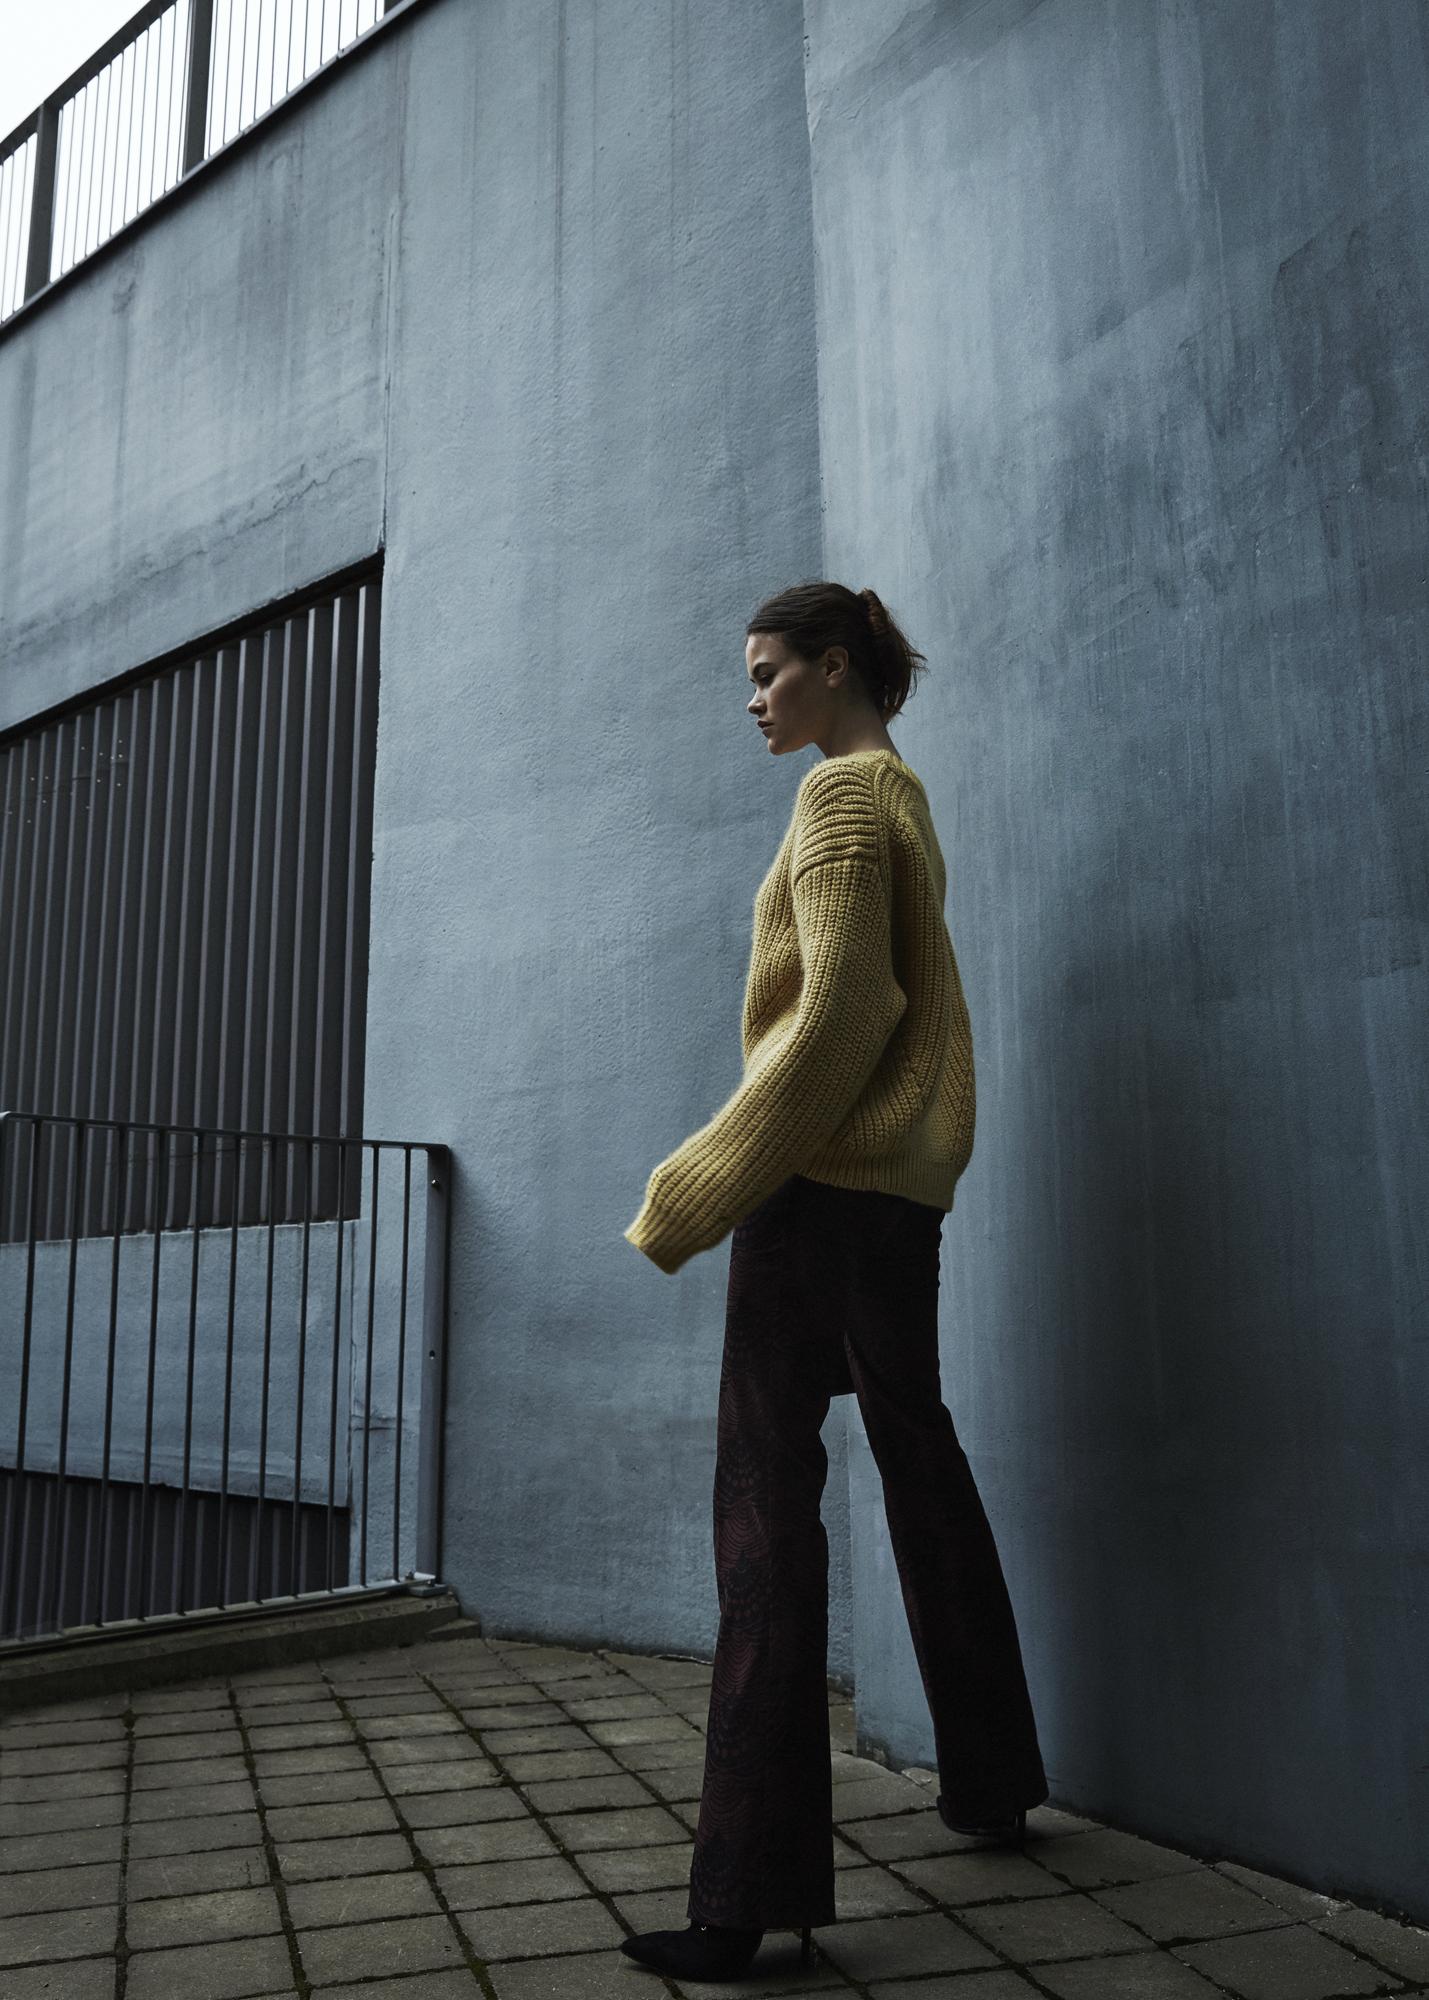 sweater  ACNE STUDIOS , pants  BAUM UND PFERDGARTEN , bag  TIGER OF SWEDEN , shoes  MAI PIU SENZA